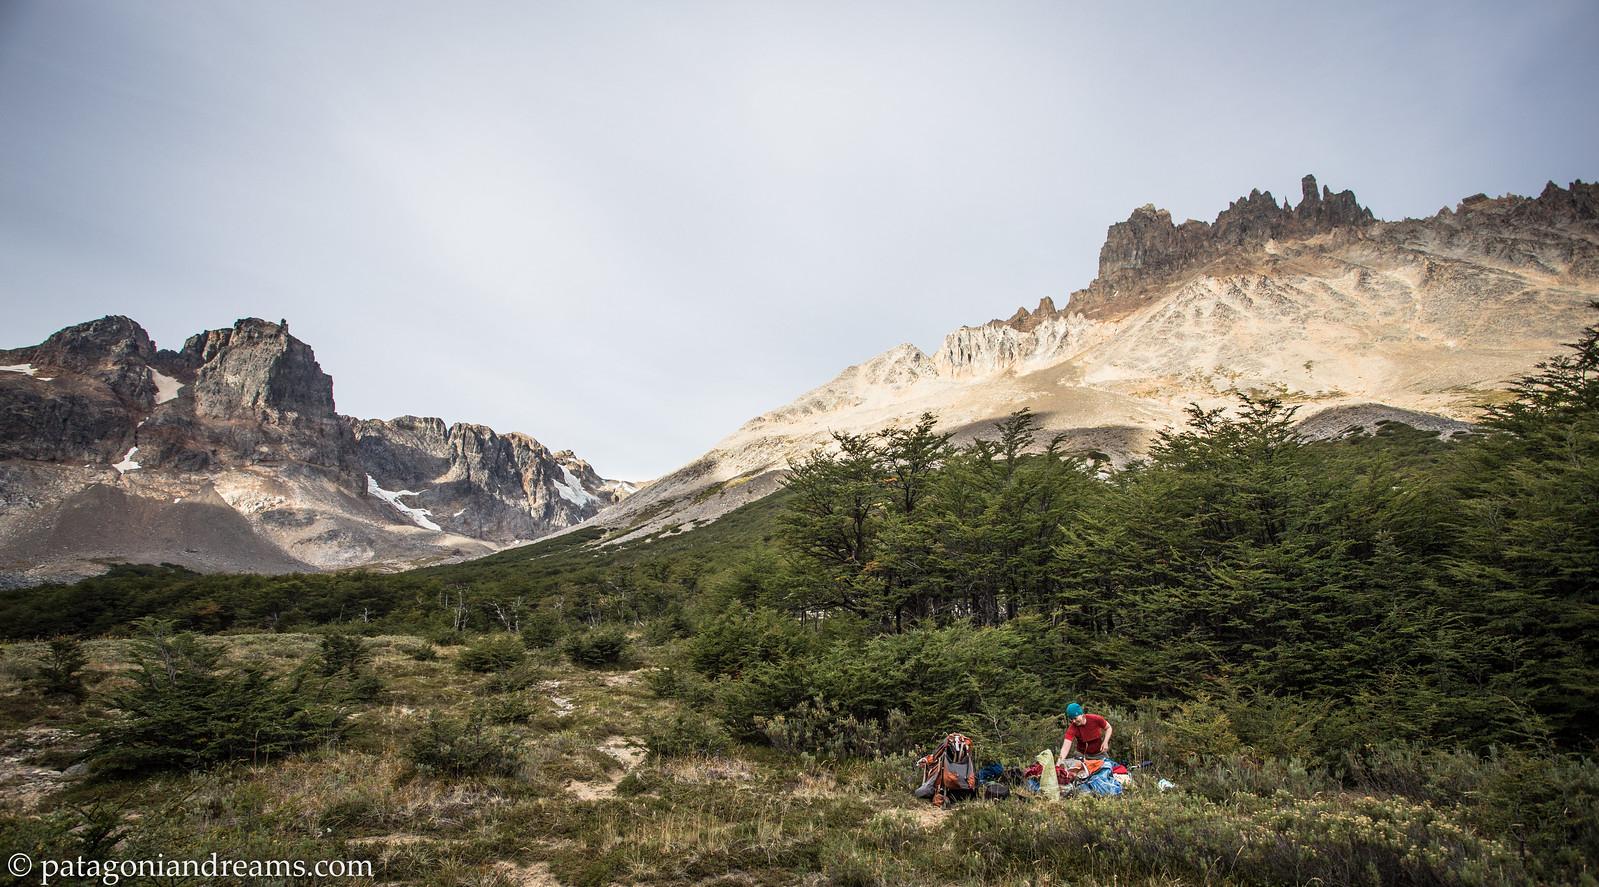 Setting up camp at campamento Neozelandés in Cerro Castillo National Reserve, Aysén Region, Patagonia, Chile.